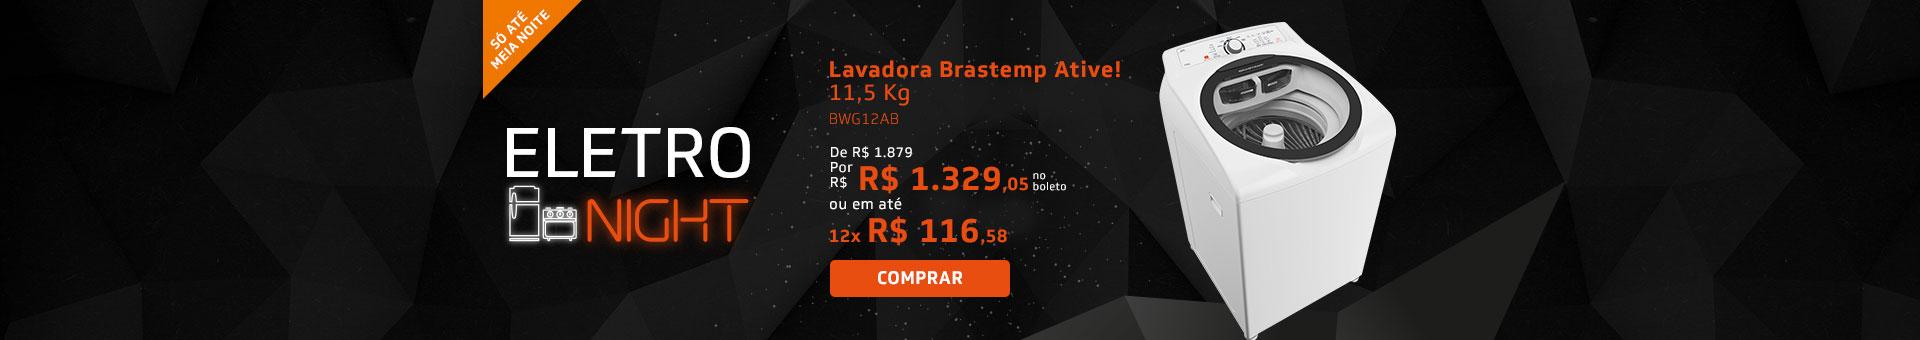 Promoção Interna - 146 - eletronight_bwg12ab_home_29072015 - bwg12ab - 2